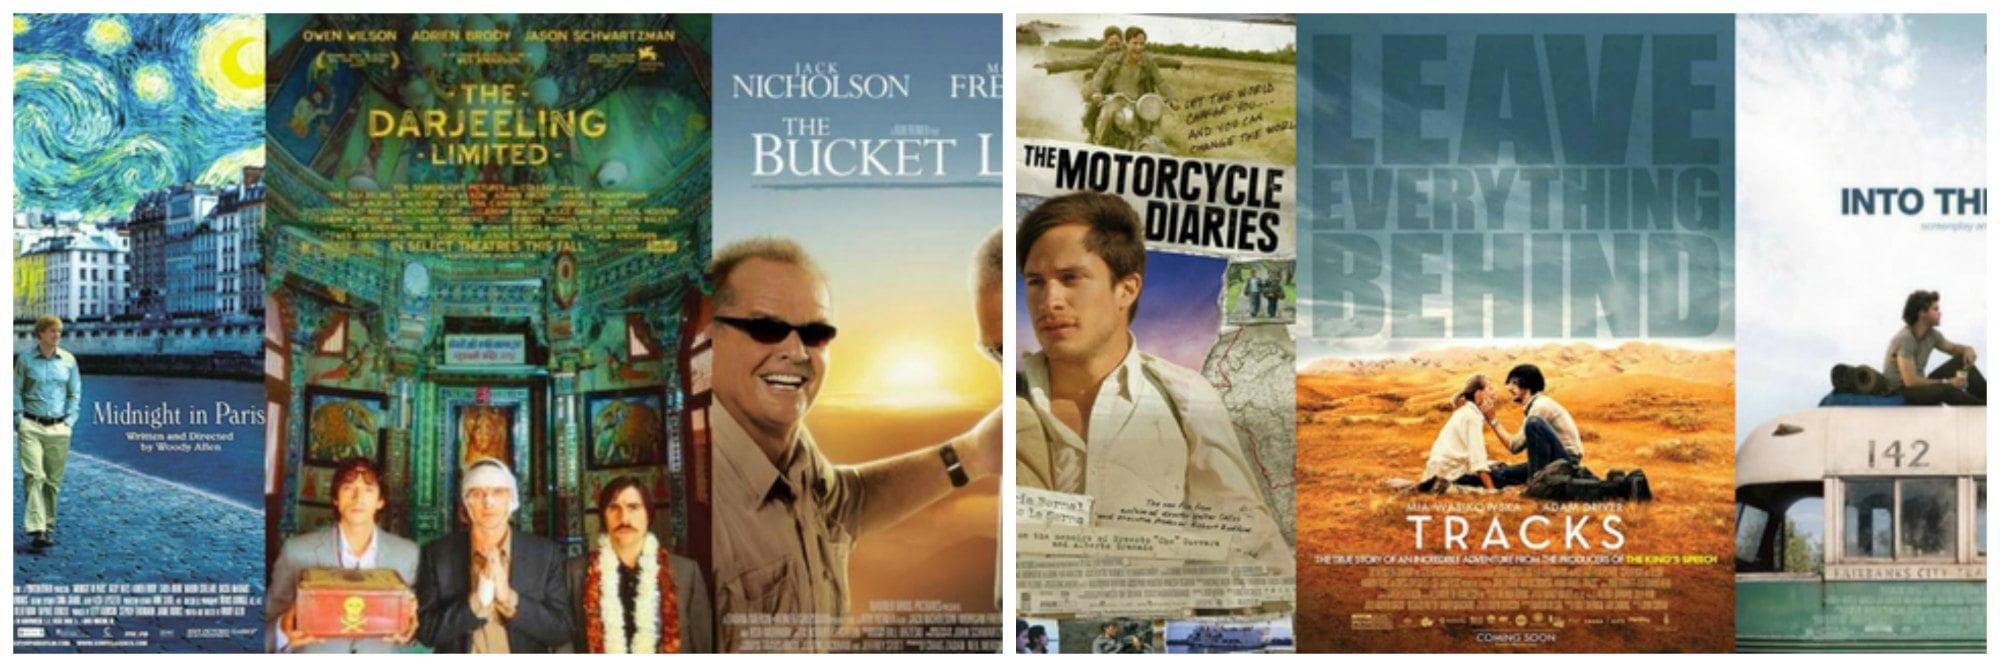 20 Best Travel Movies To Inspire Wanderlust